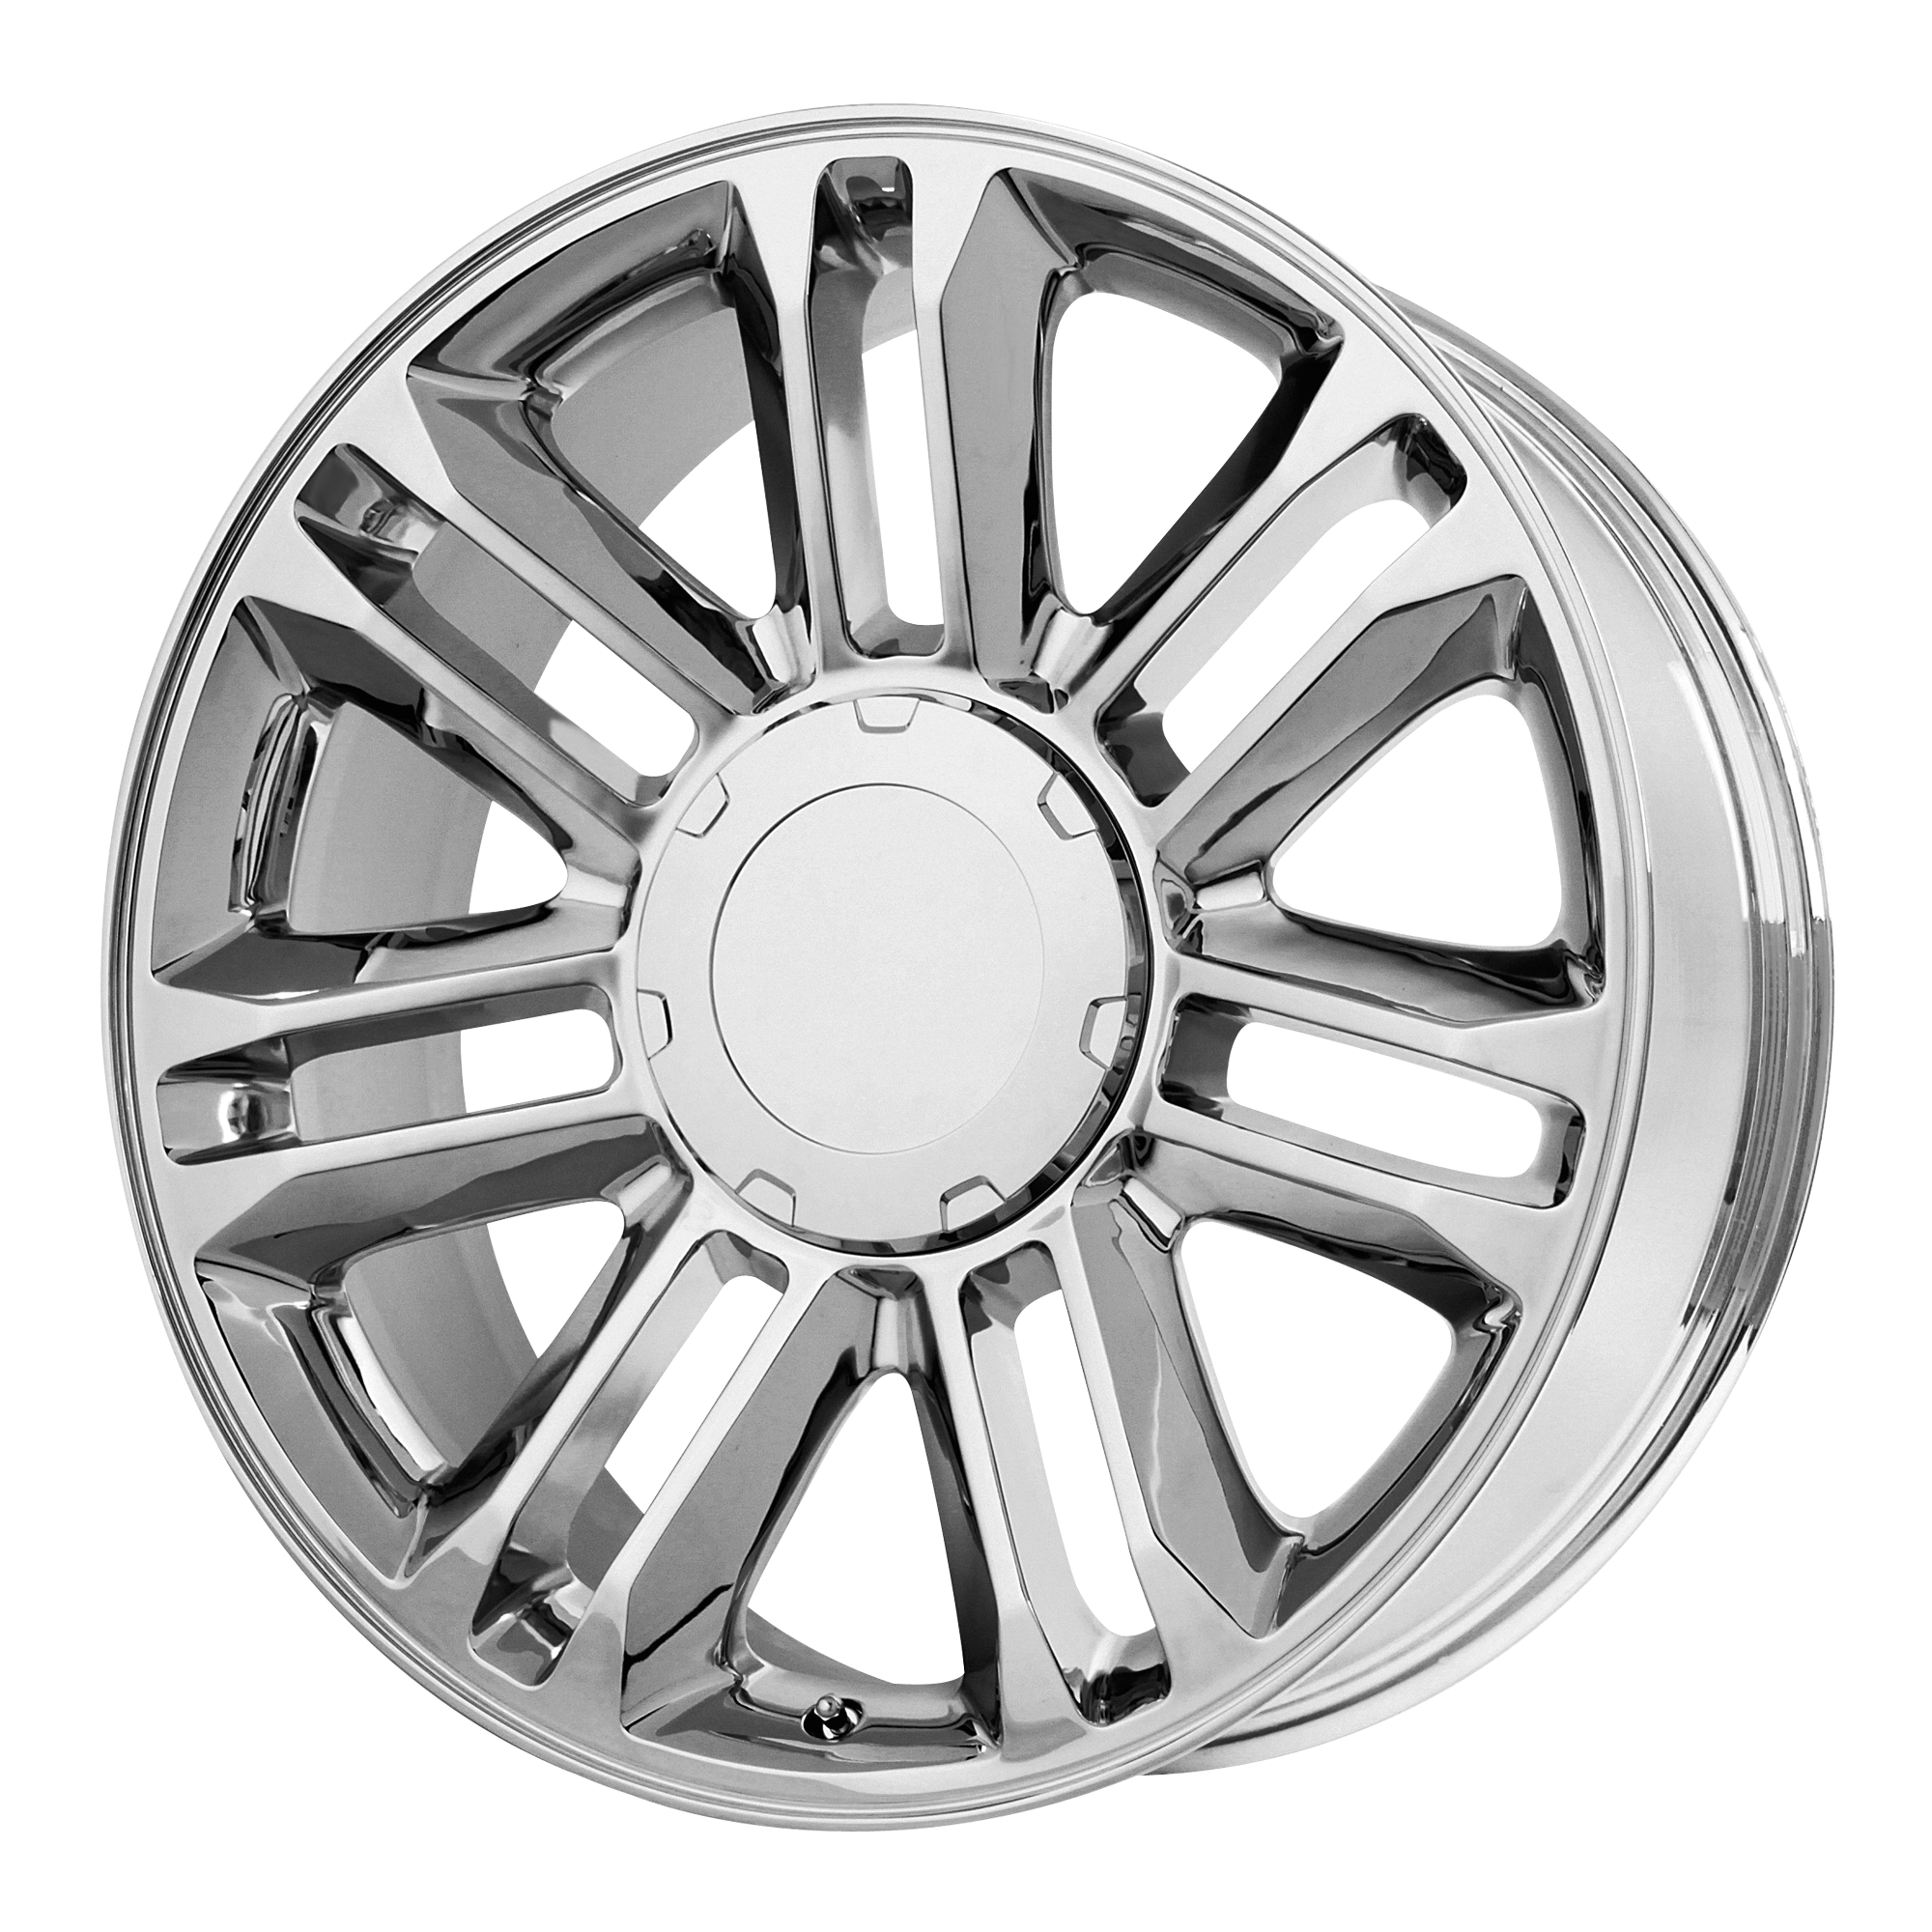 OE Creations Replica Wheels OE Creations PR132 Chrome